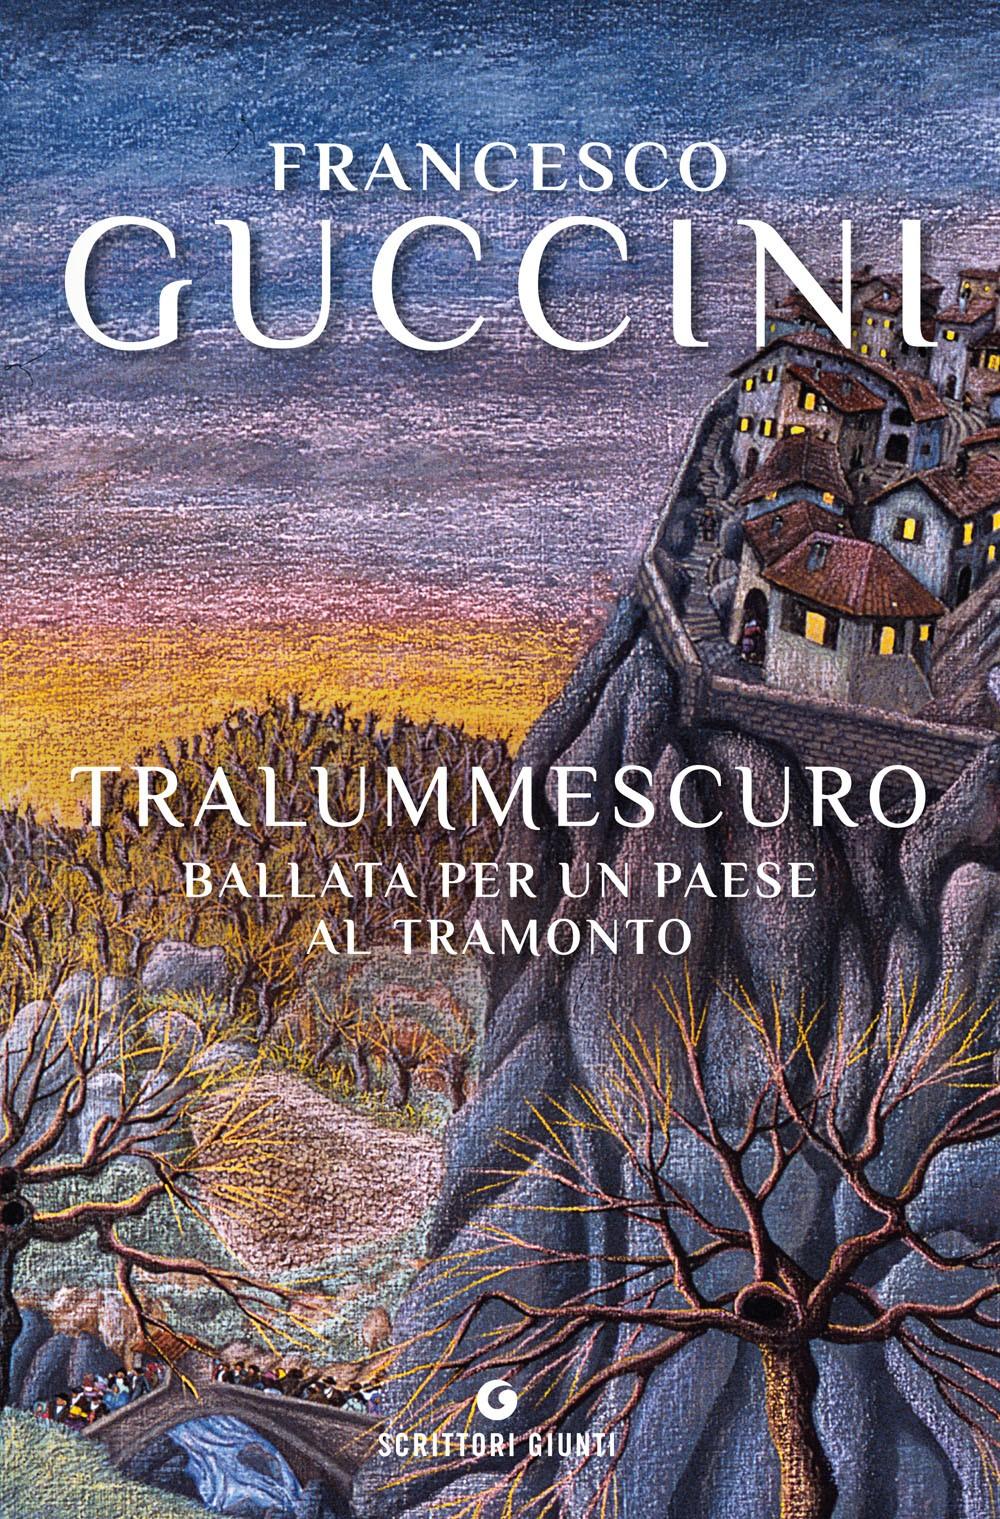 Tralummescuro. Ballata per un paese al tramonto (Tralummescuro. Ballad for a vanishing town)